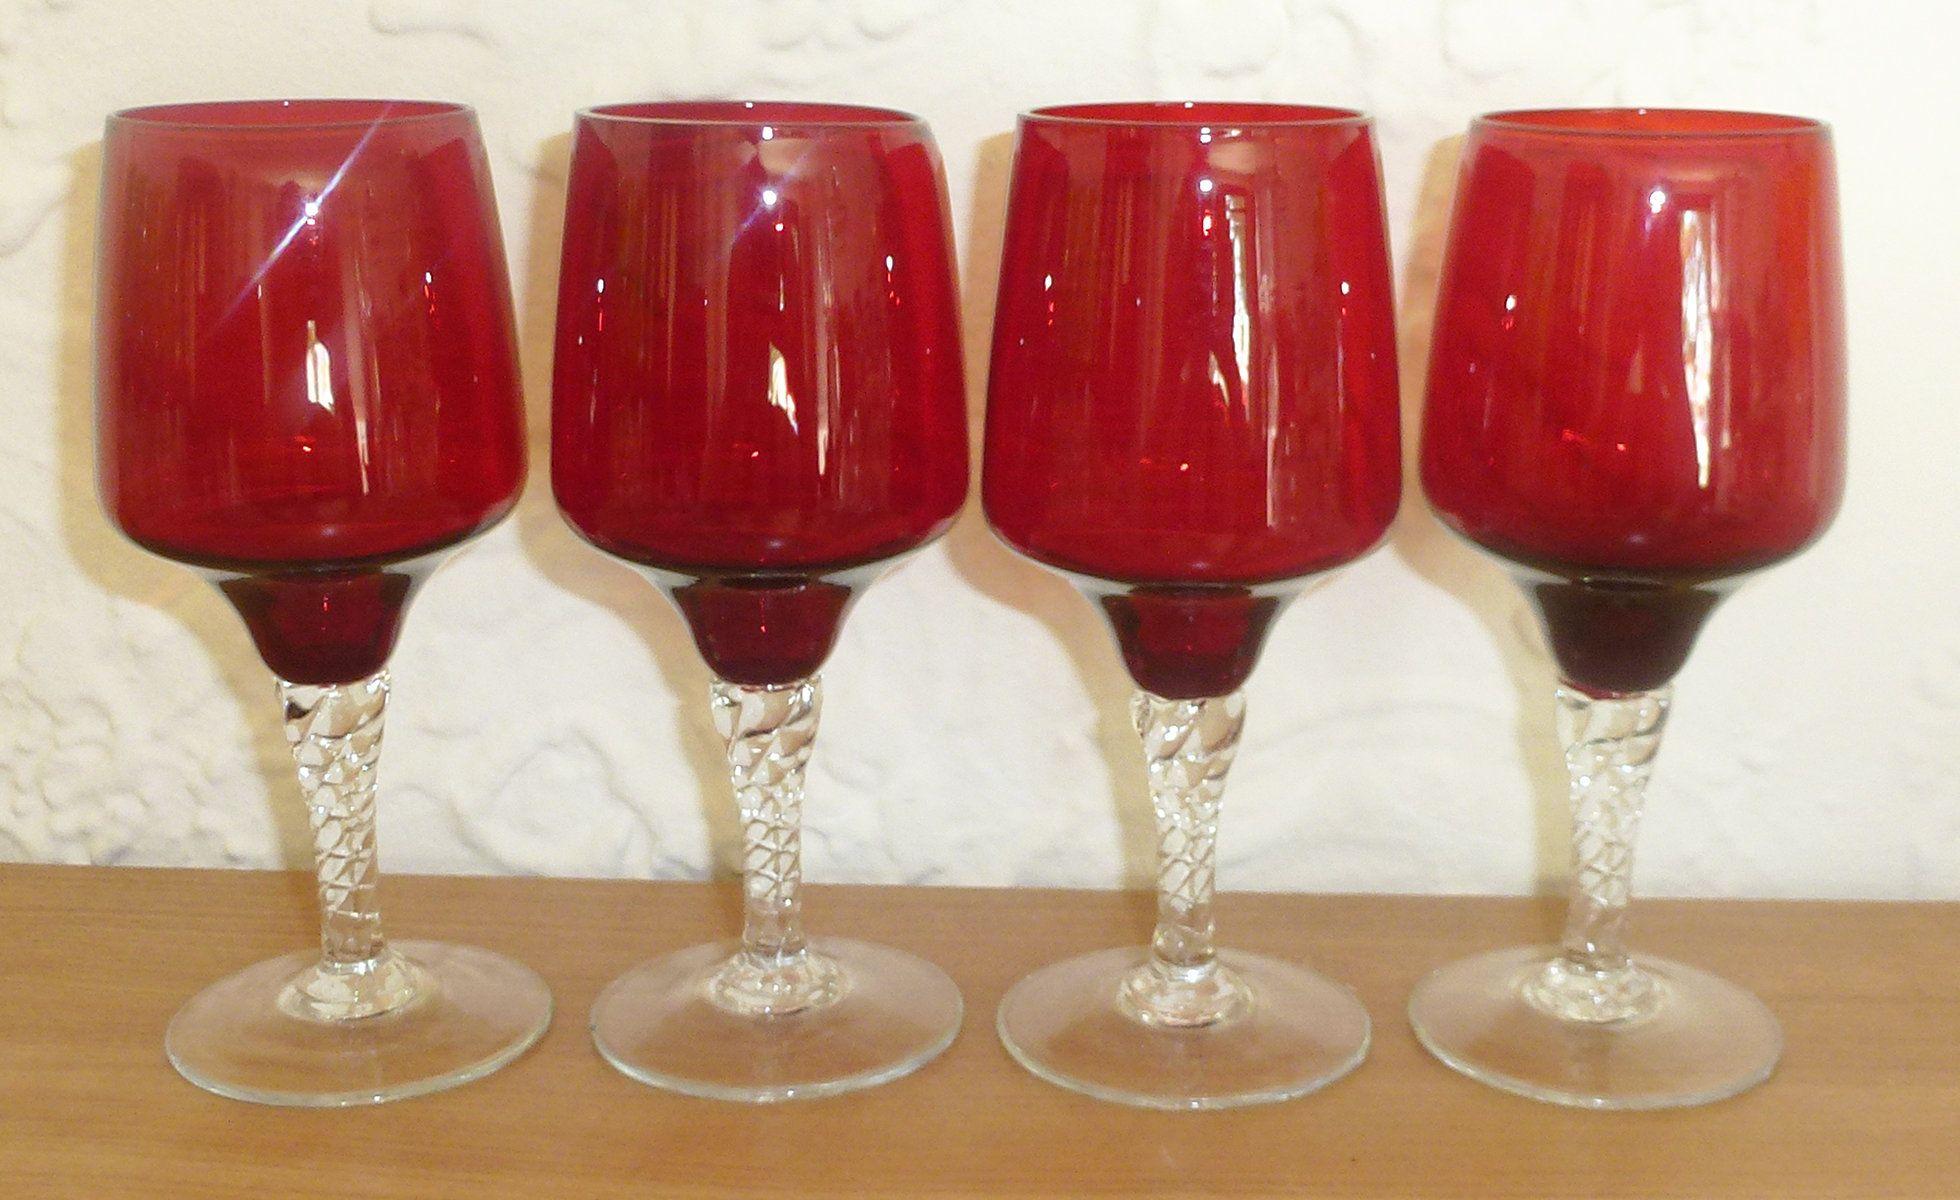 Set Of 4 Vintage Claret Ruby Red White Wine Glasses Tumblers Etsy White Wine Glasses Unique Glassware Wine Glasses